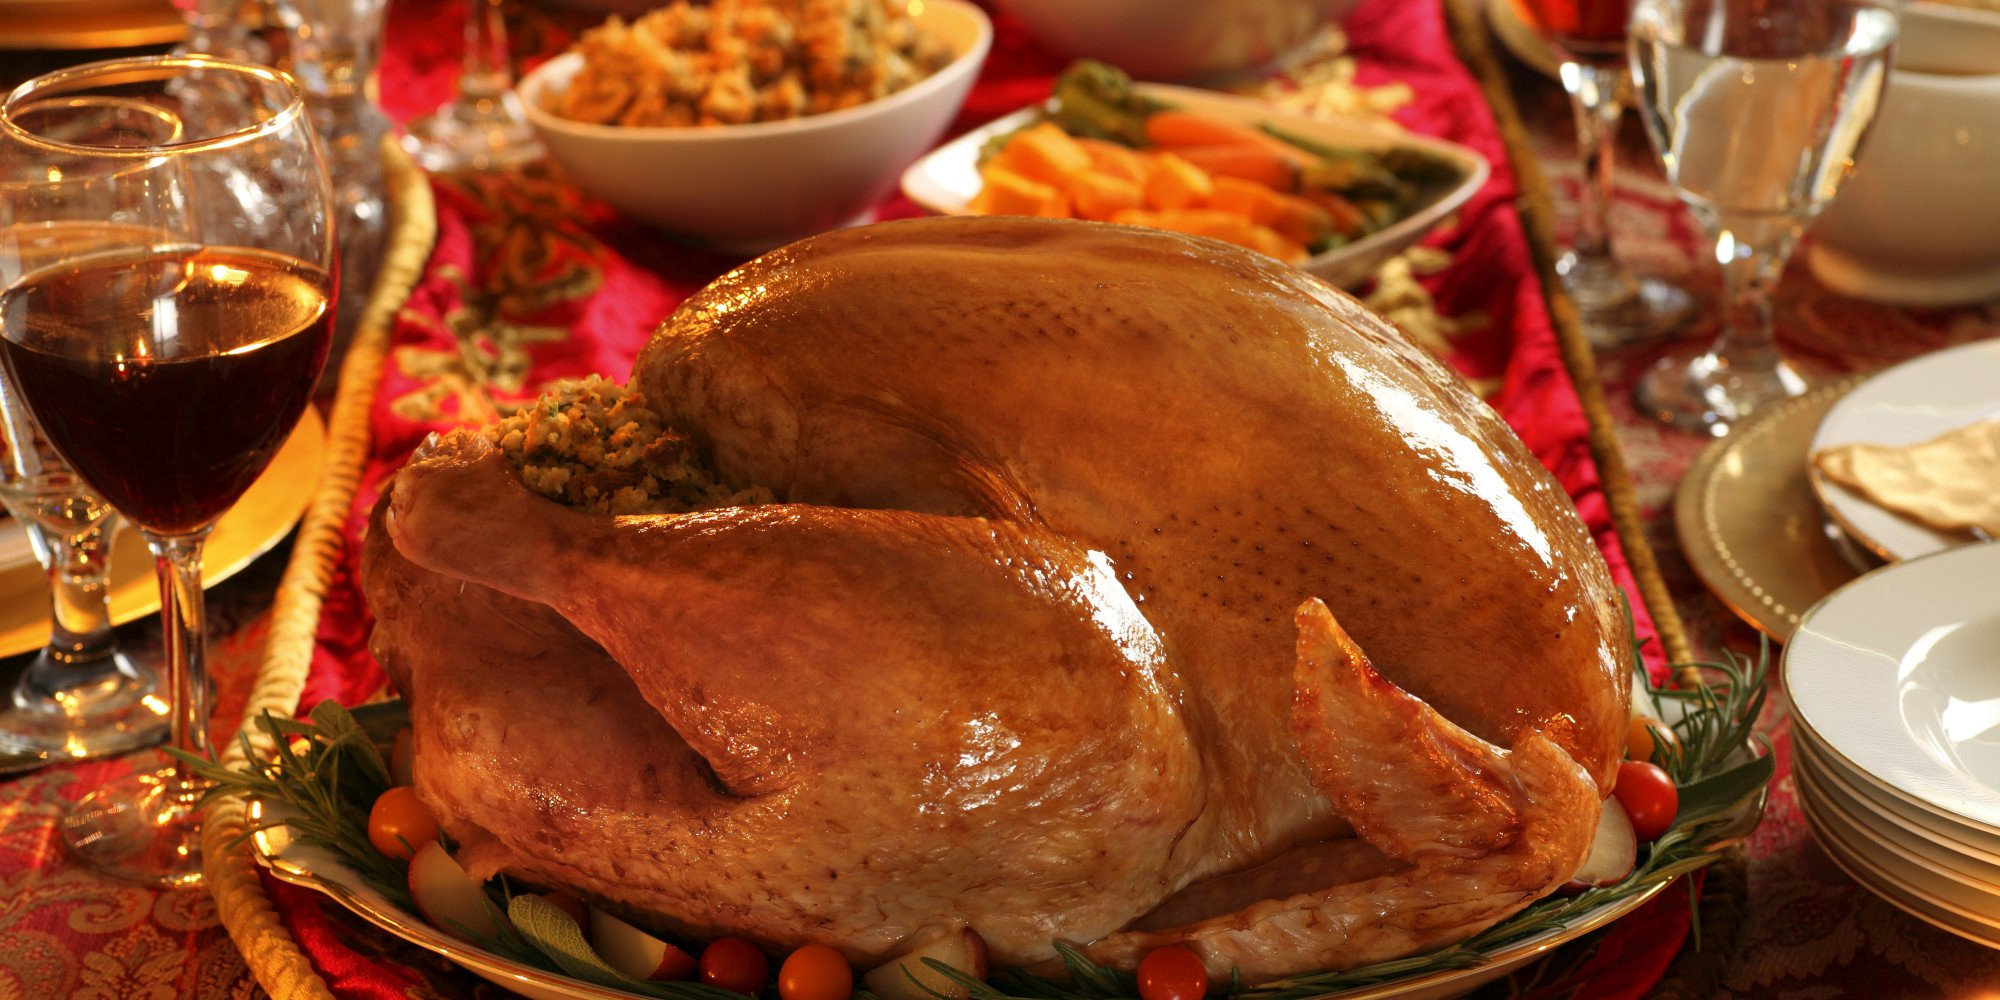 Restaurant Thanksgiving Dinner  Can't Cook R4L s Top 5 Restaurants Serving Thanksgiving